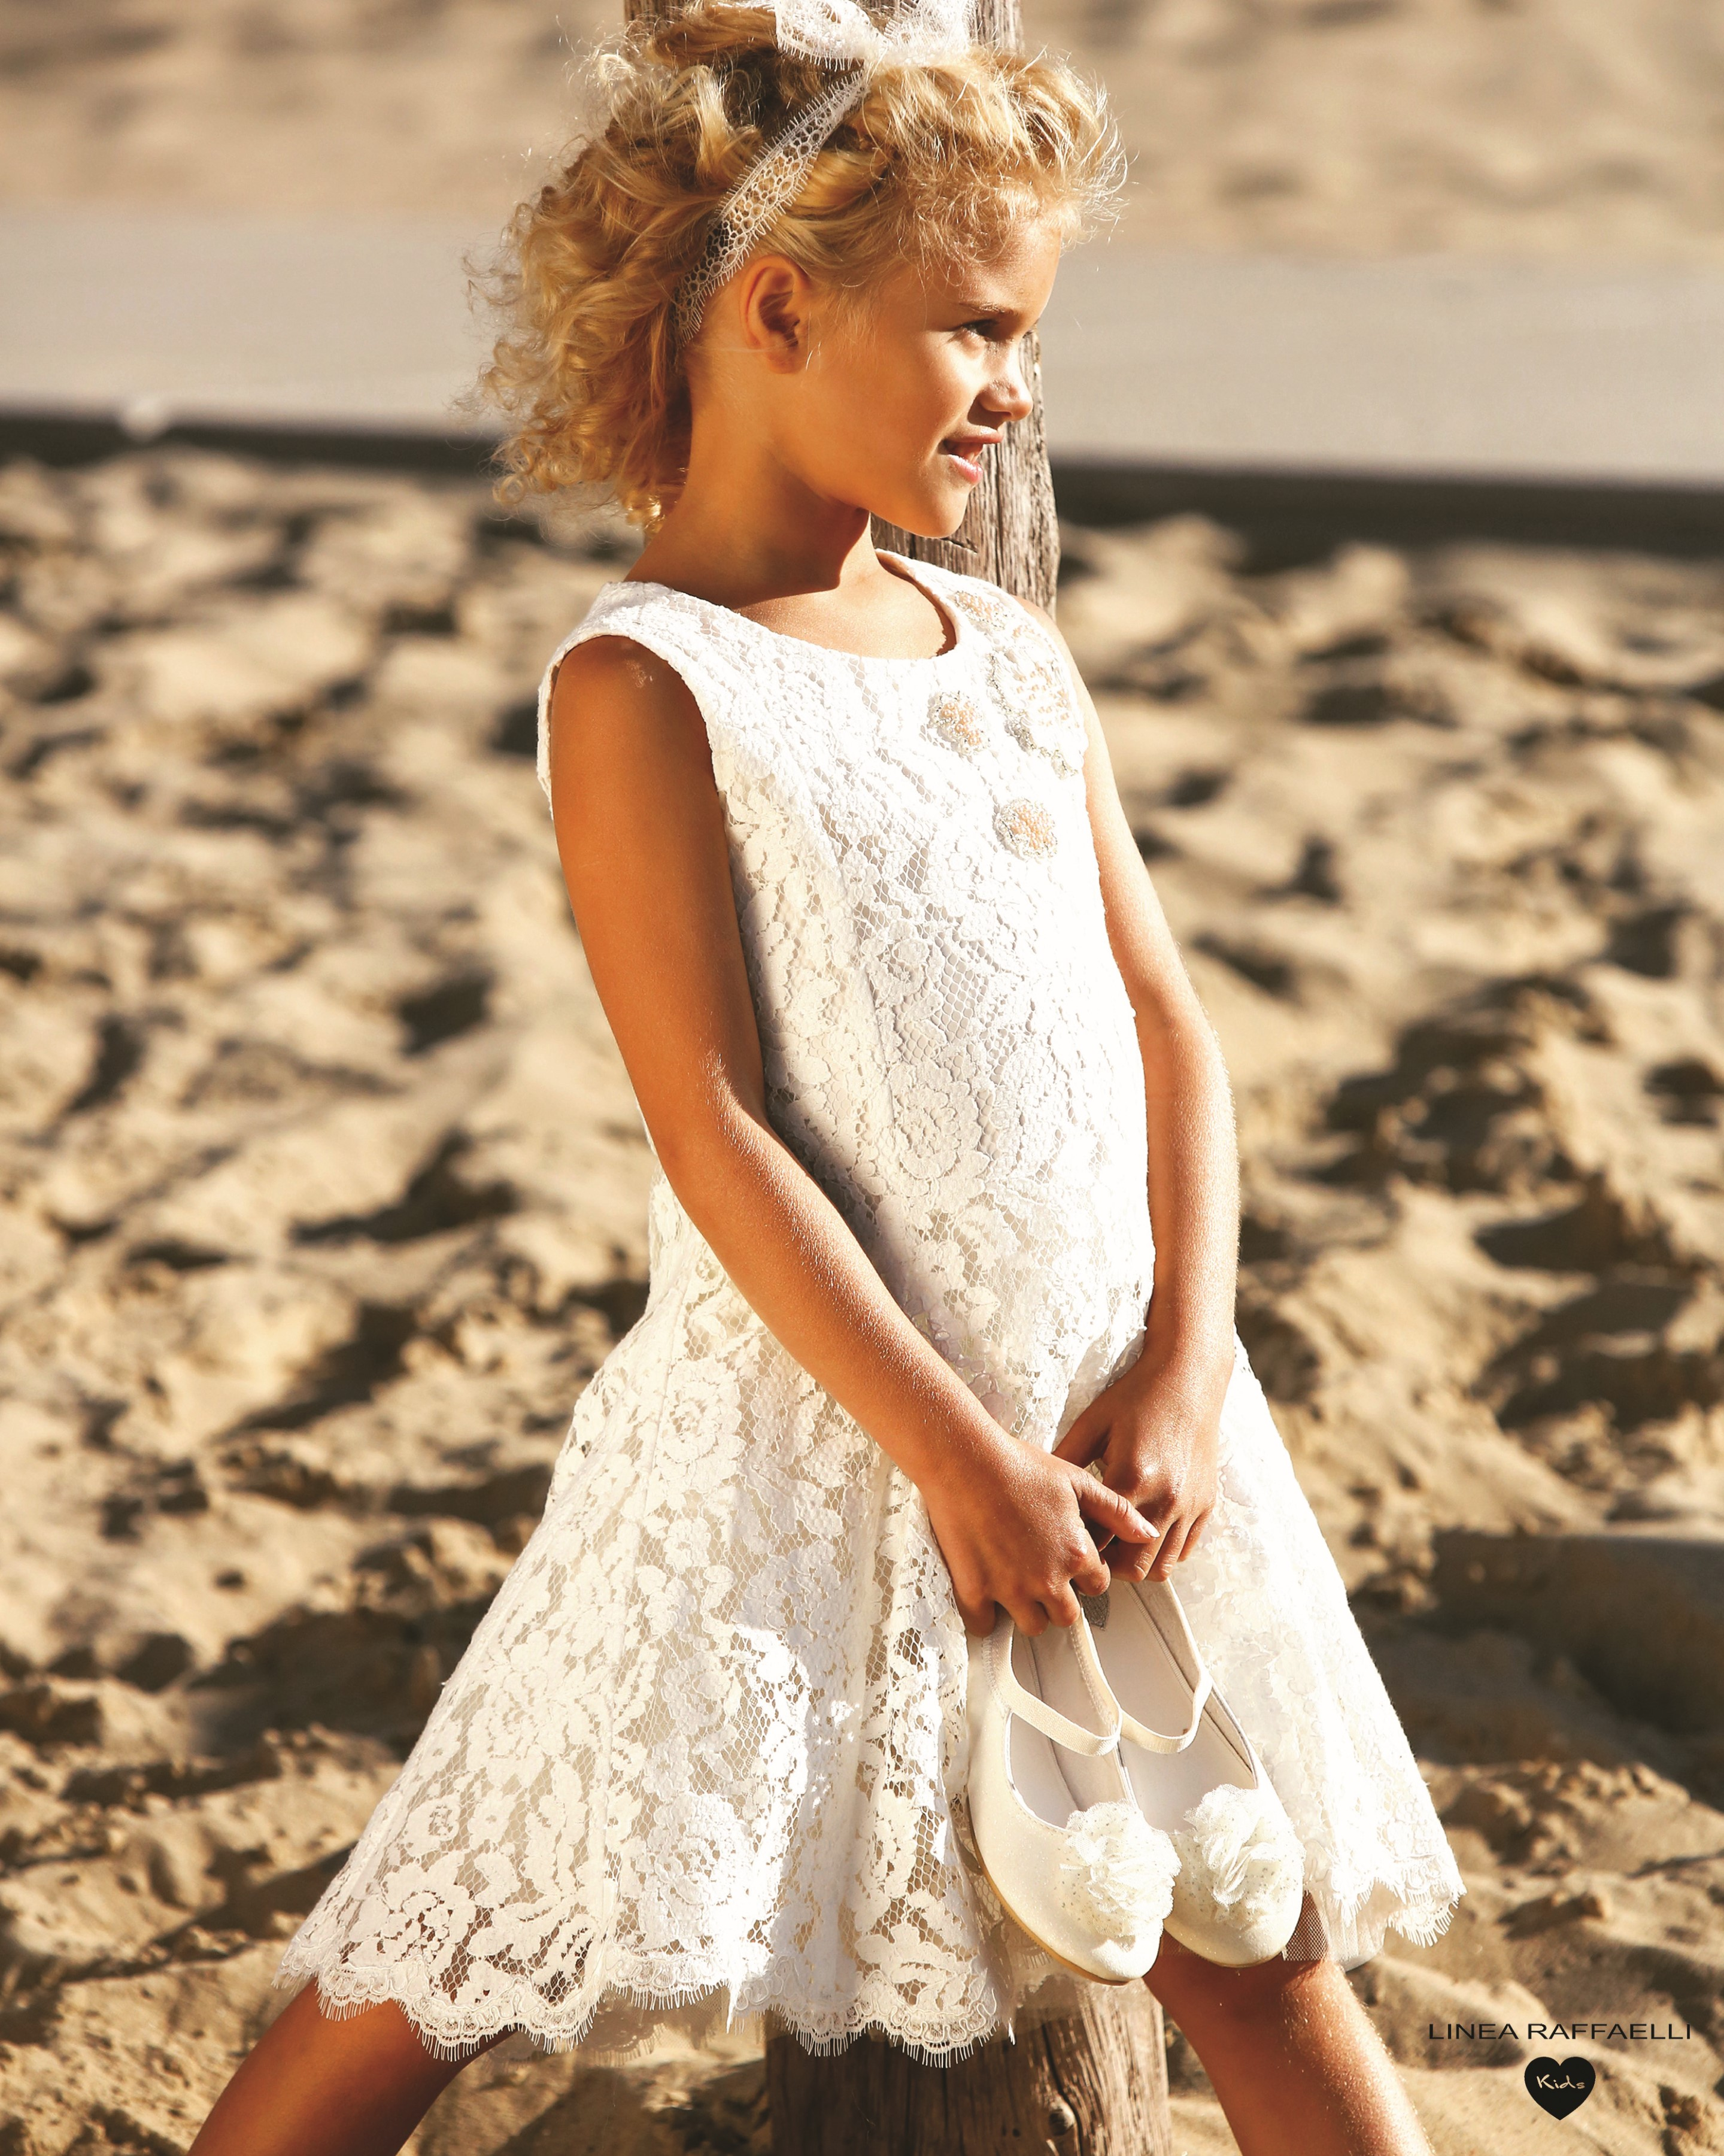 Linea Raffaelli Kids 24612